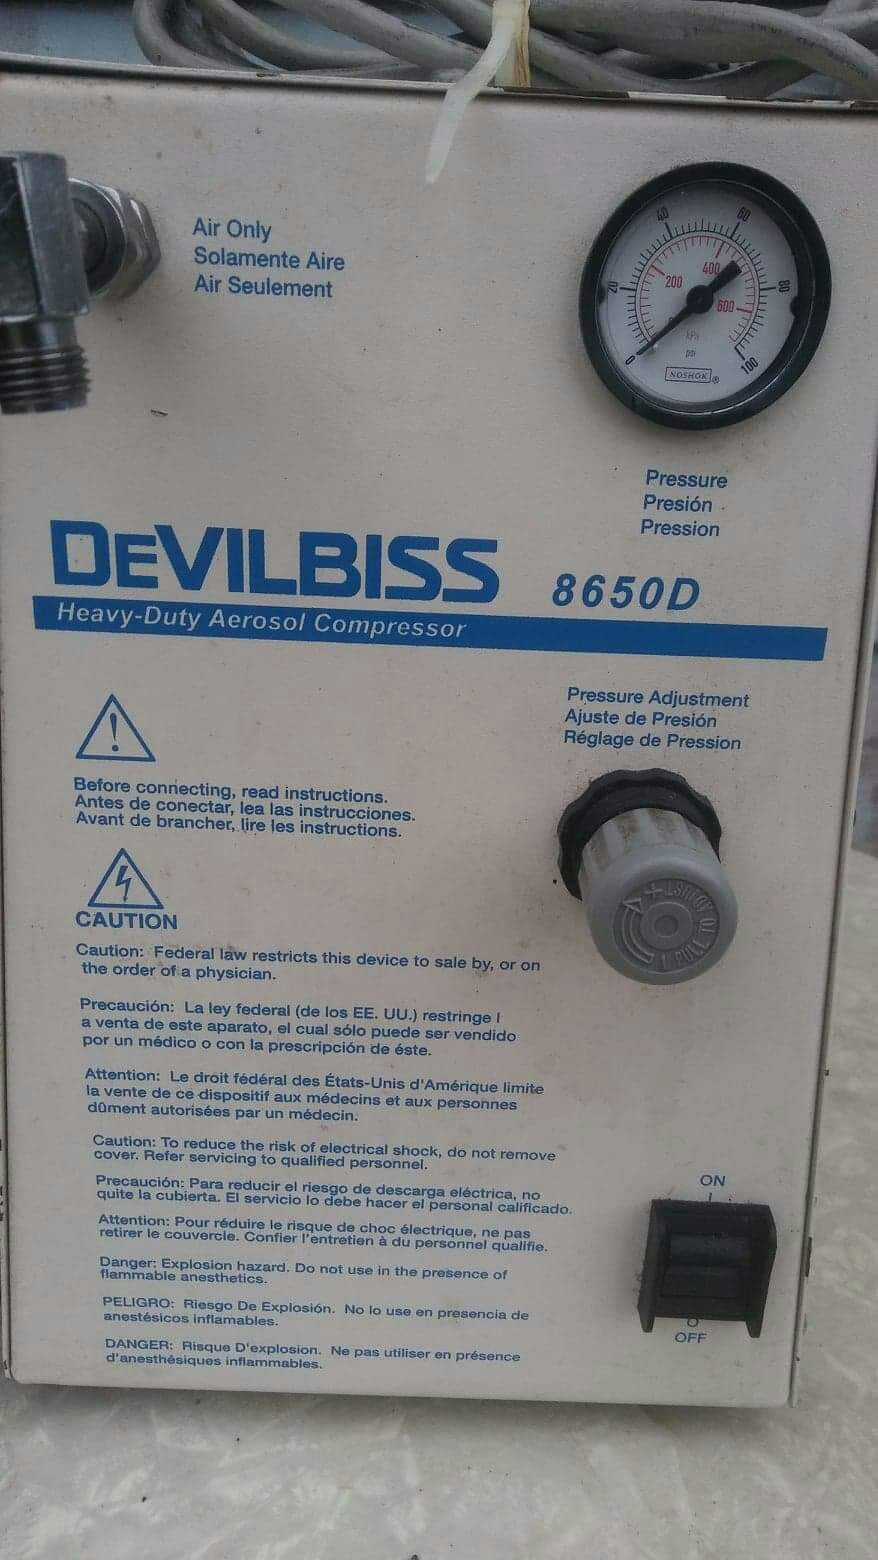 Devilbiss healthcare Heavy-duty Aerosol